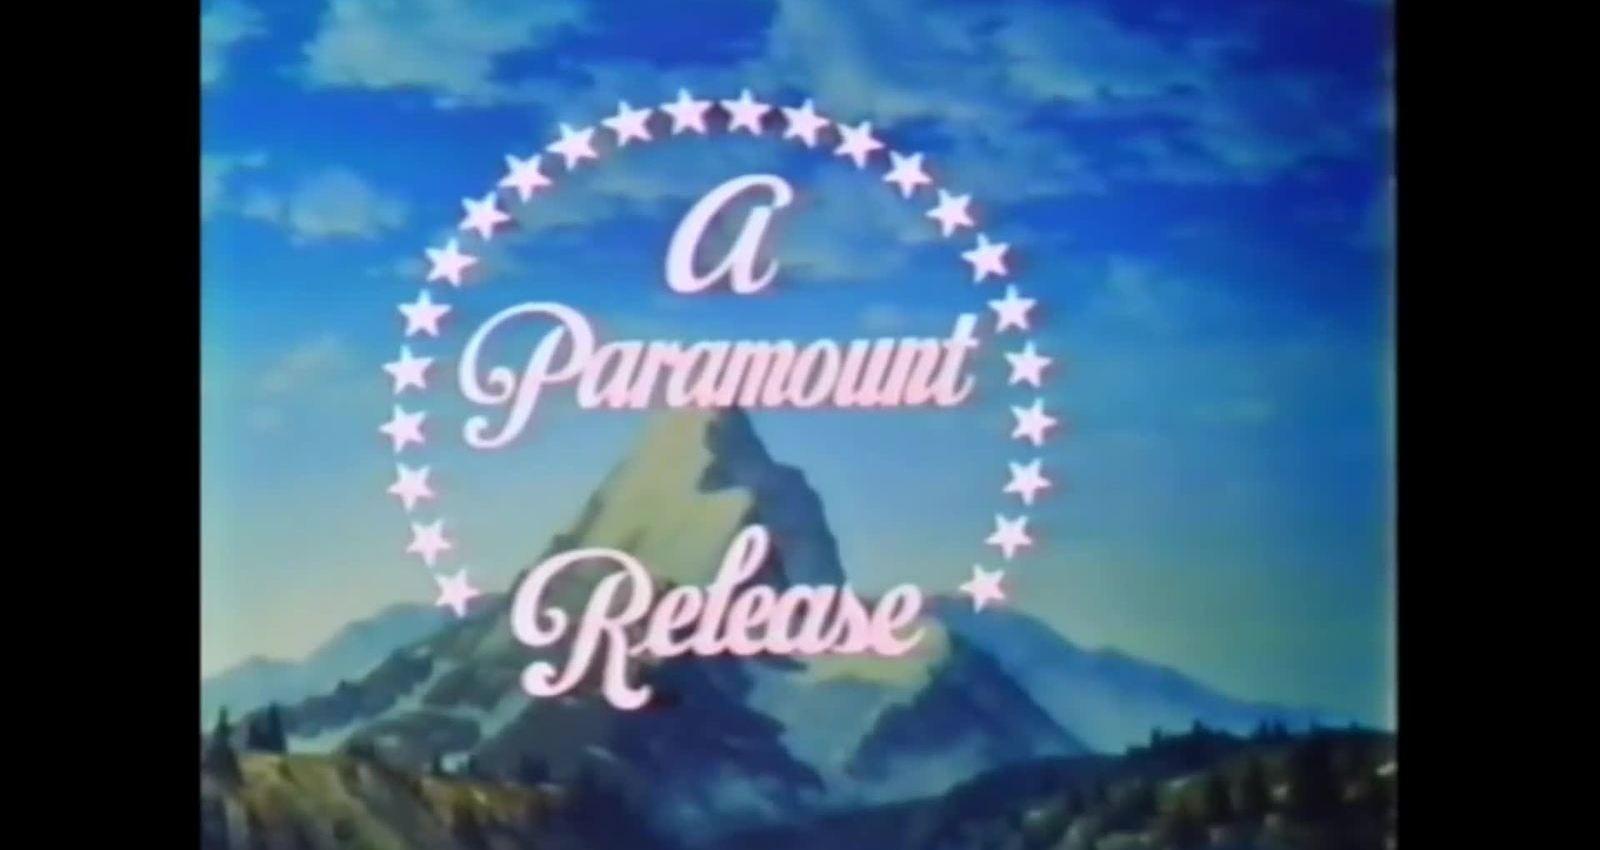 A Mountain of Entertainment